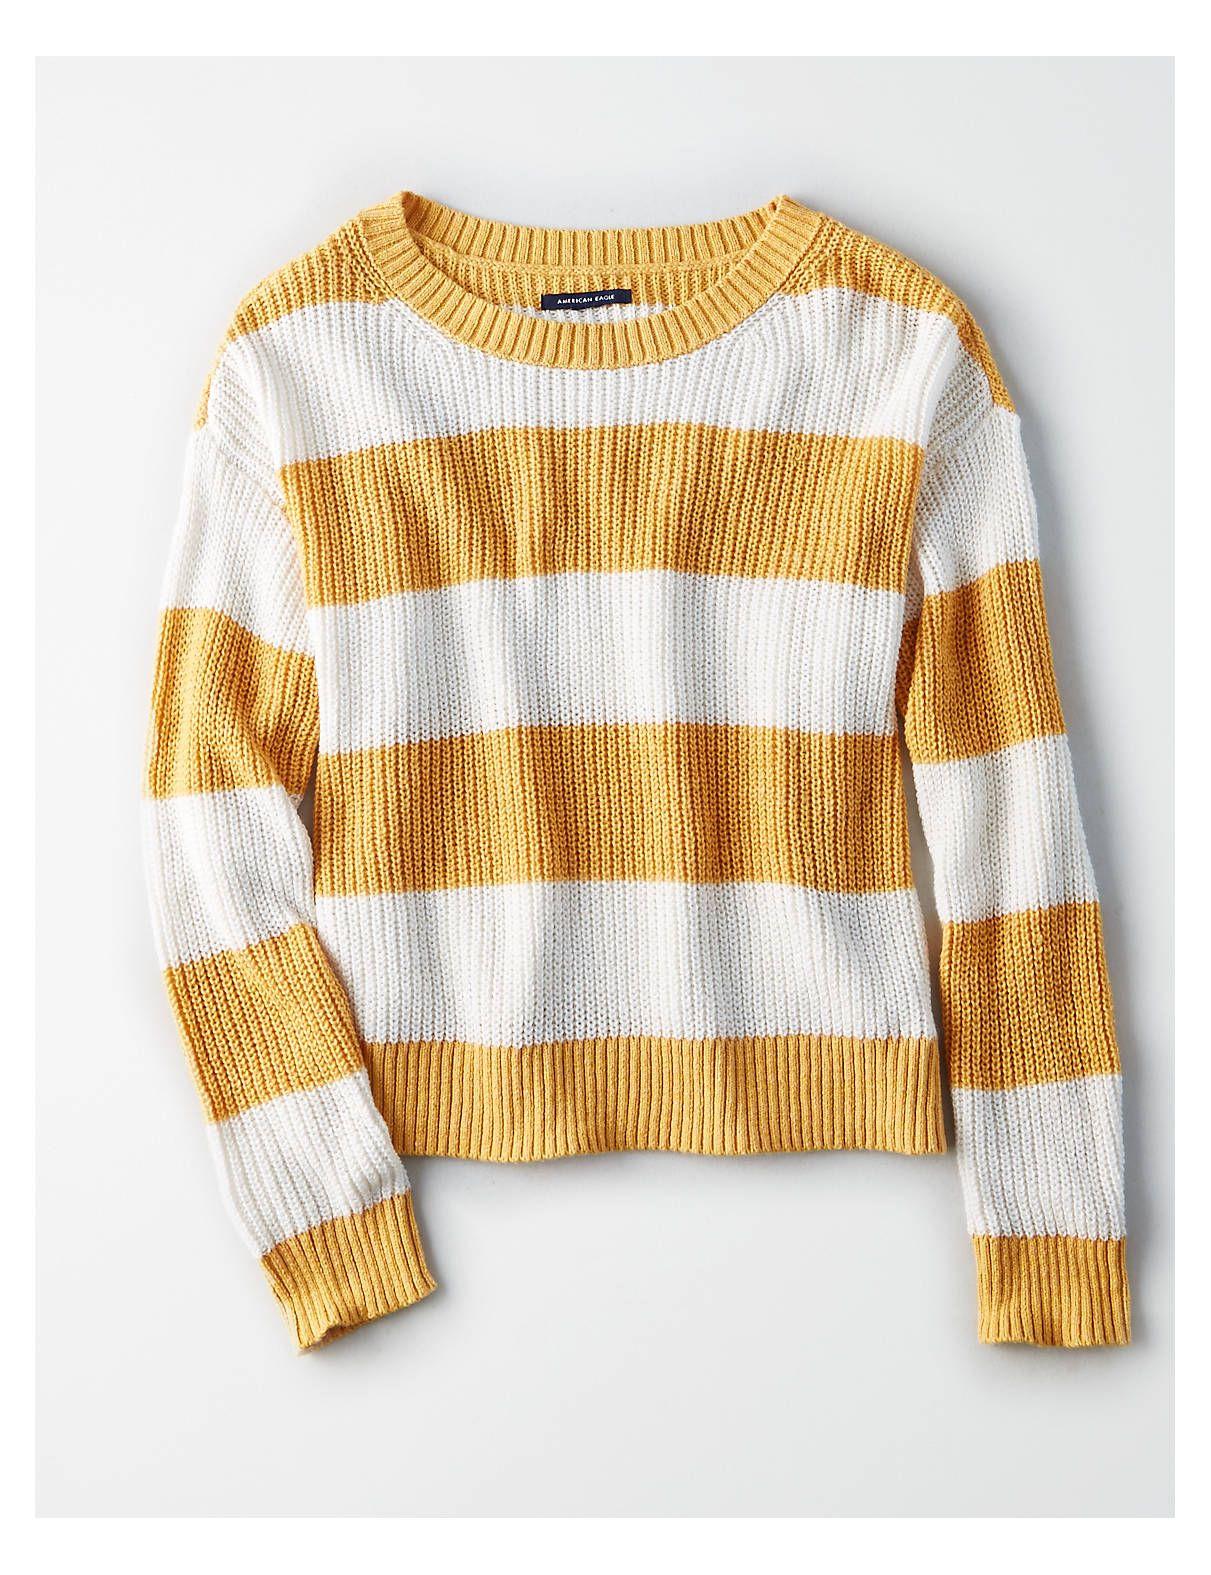 9b4f54225c AE Rugby Stripe Sweater, Mustard | American Eagle Outfitters American Eagle  Tops, American Eagle